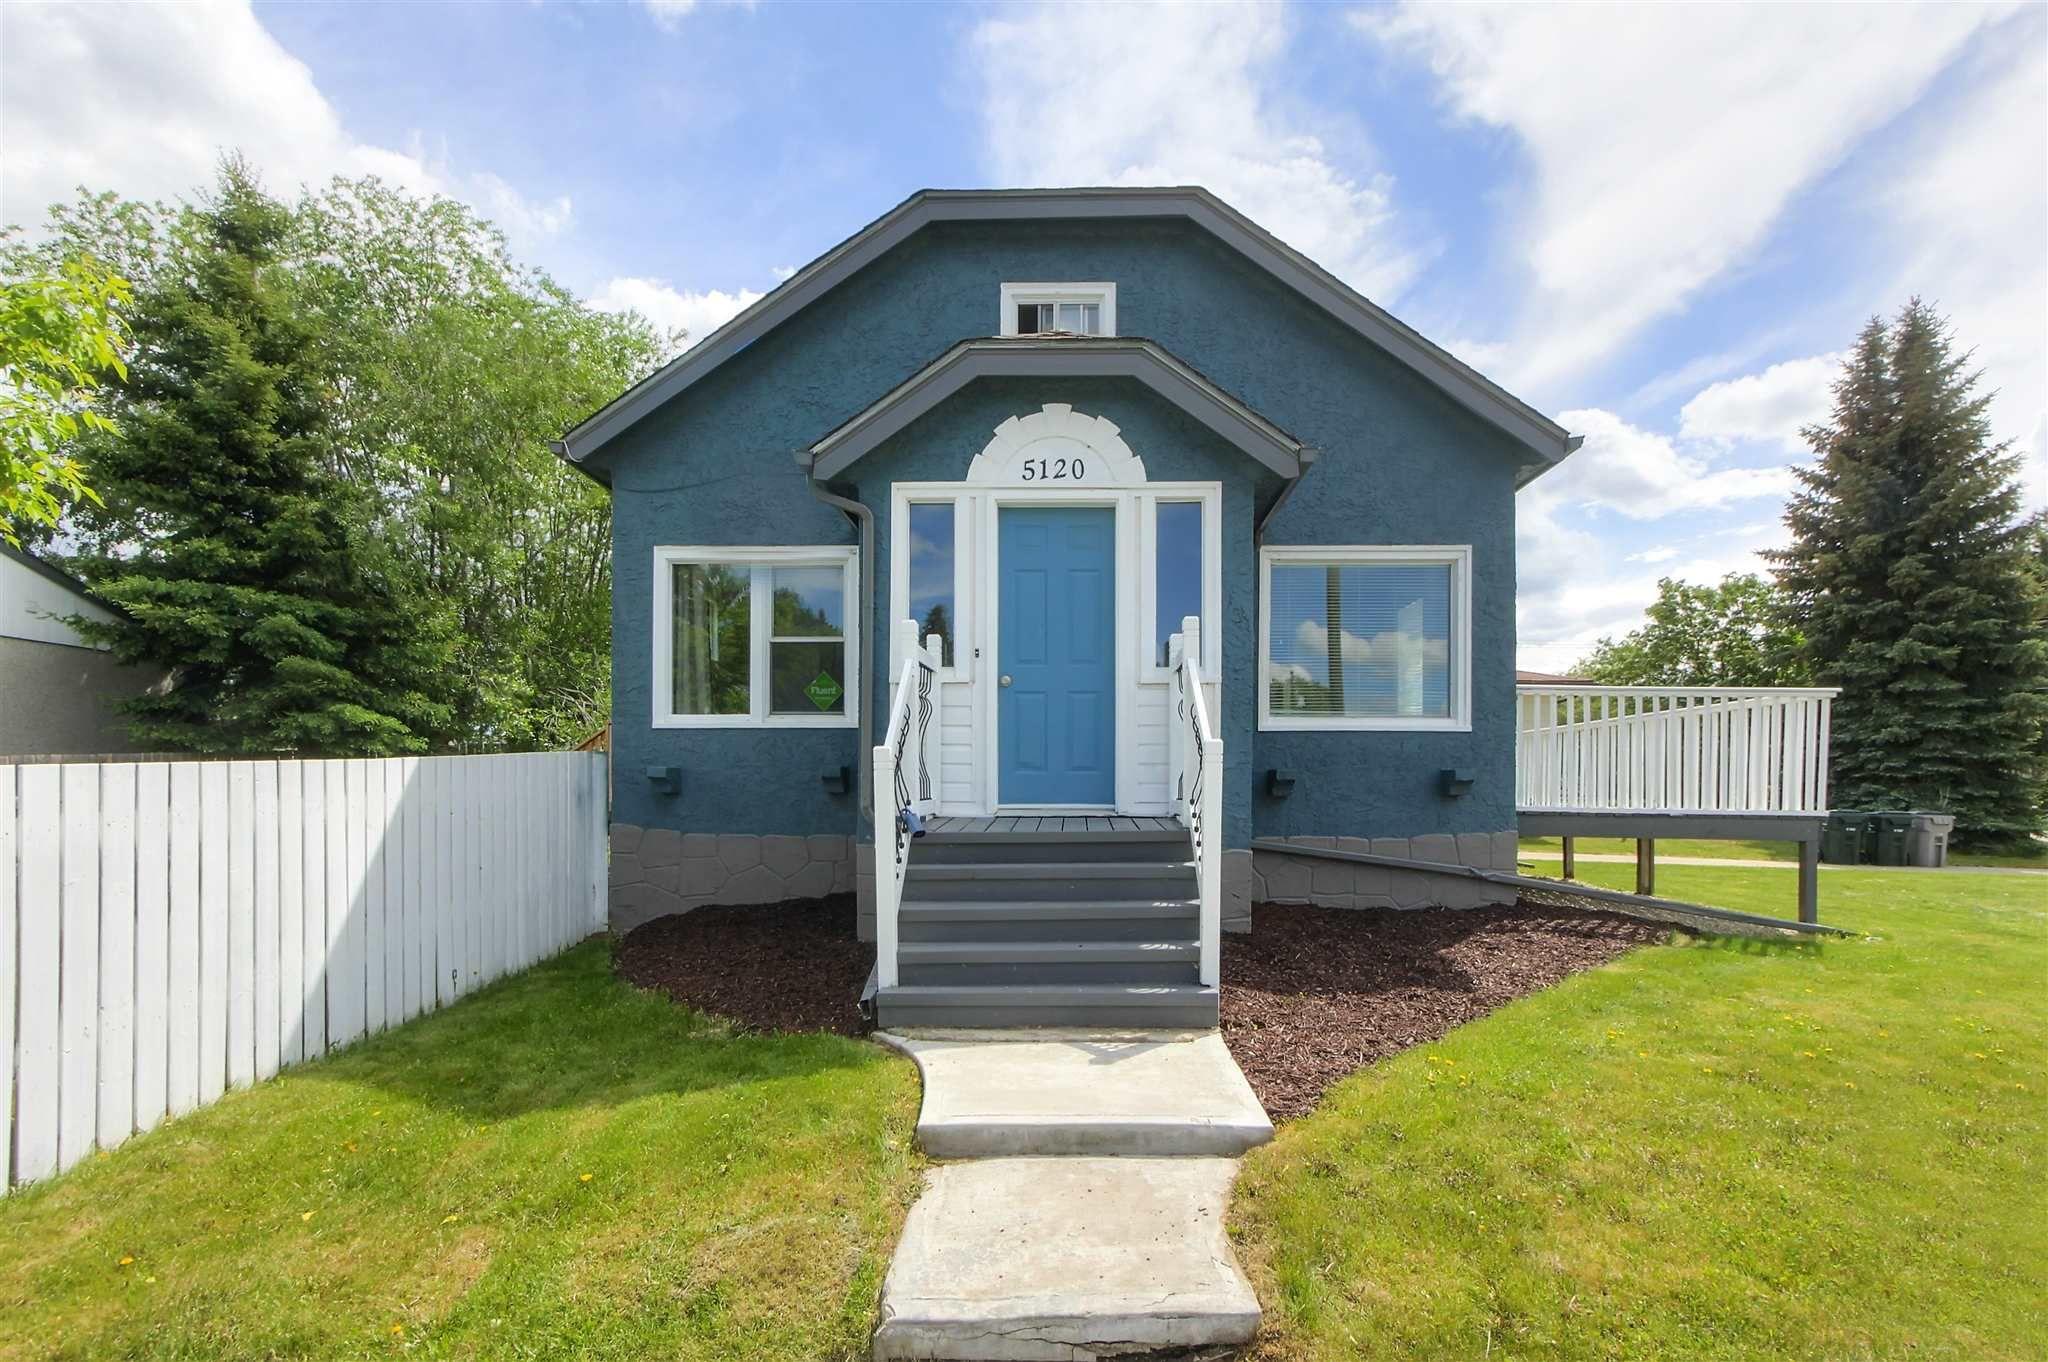 Main Photo: 5120 52 Avenue: Stony Plain House for sale : MLS®# E4248798